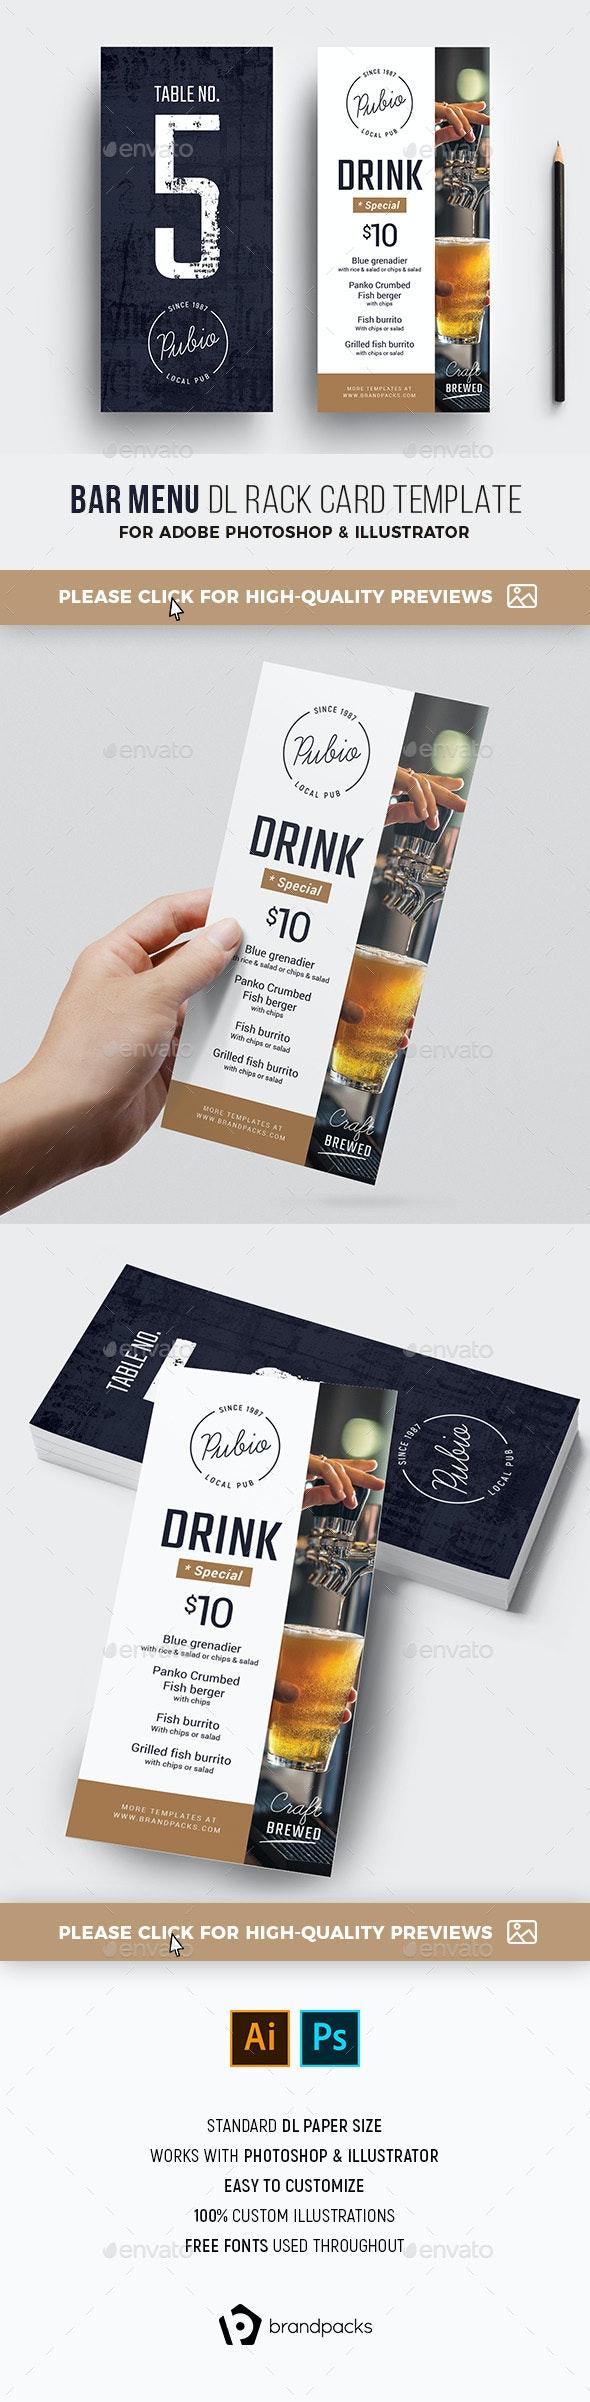 Bar Menu DL Rack Card - Restaurant Flyers